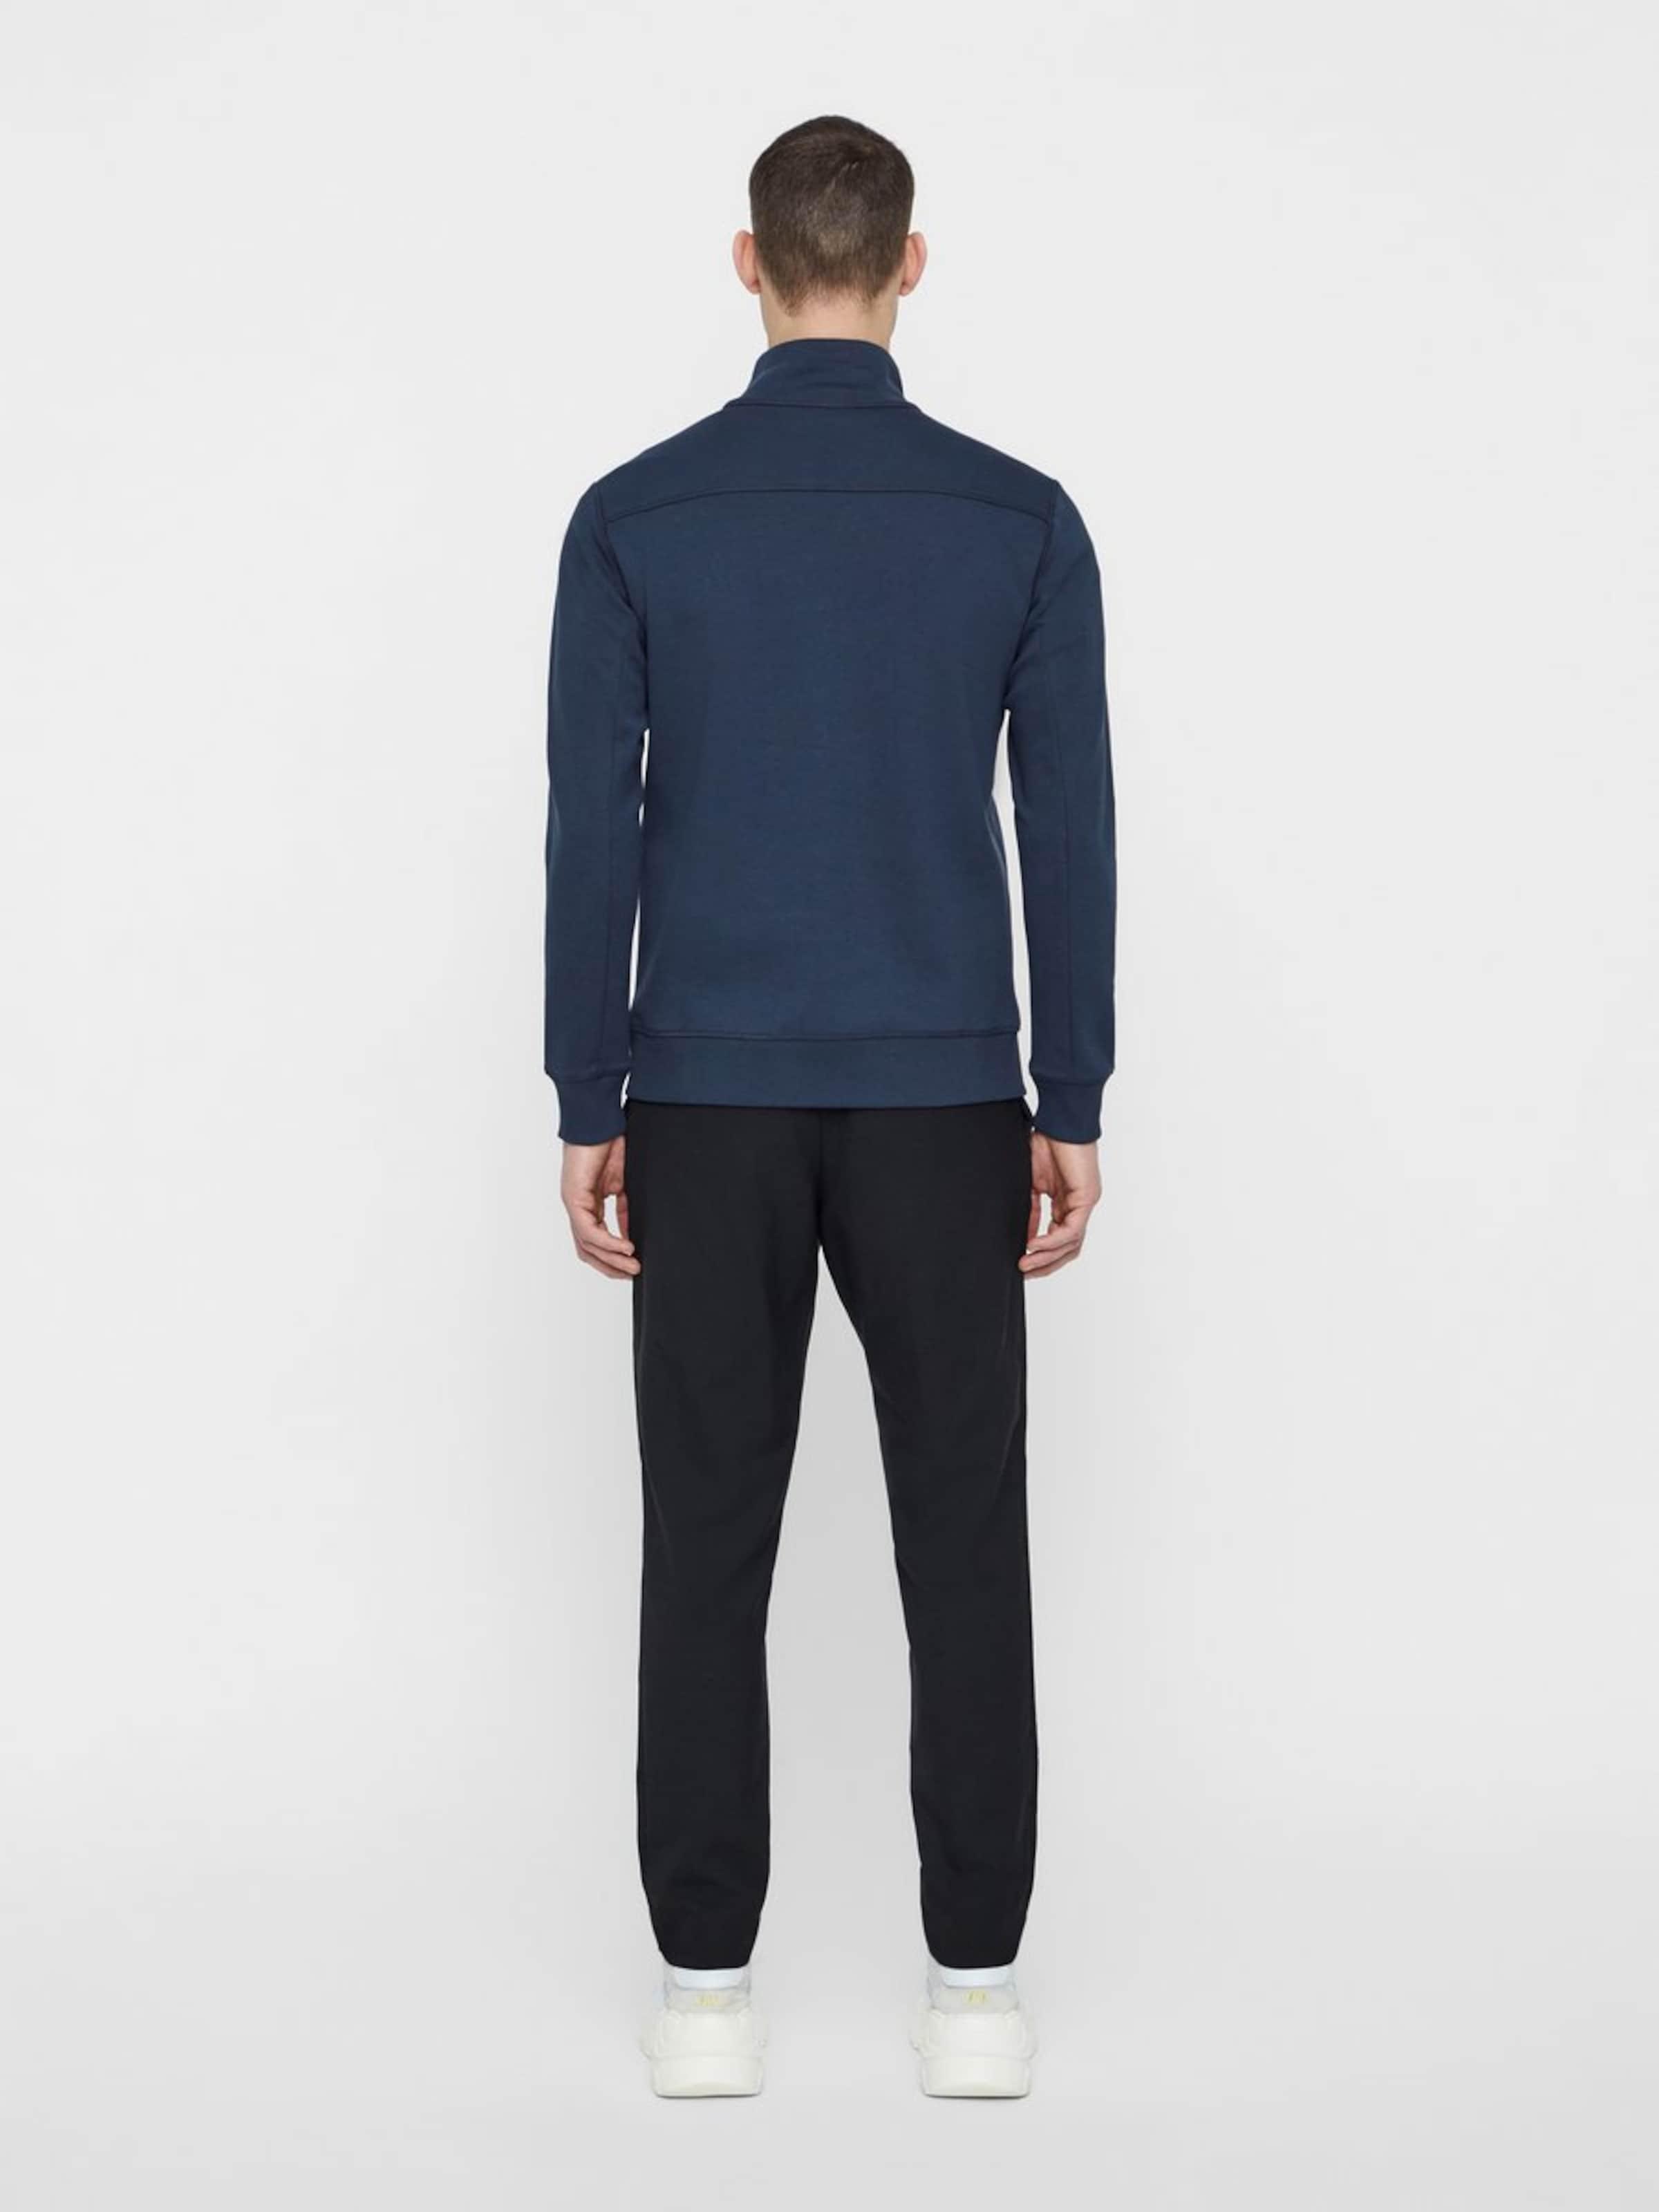 Bleu Sweat Marine lindeberg 'koby' En shirt J Sc5A4Rjq3L